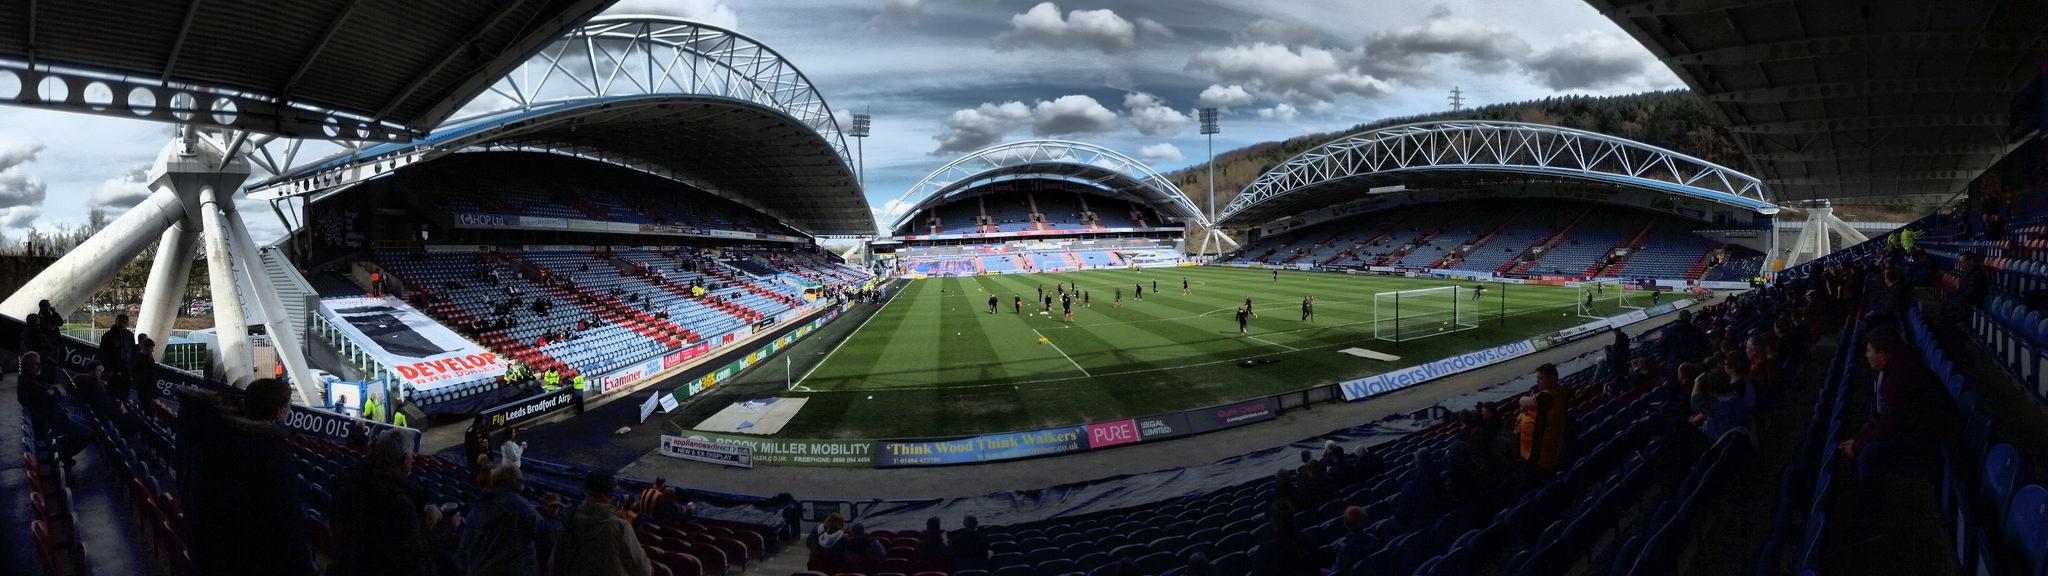 Huddersfield Town - John Smiths Stadium